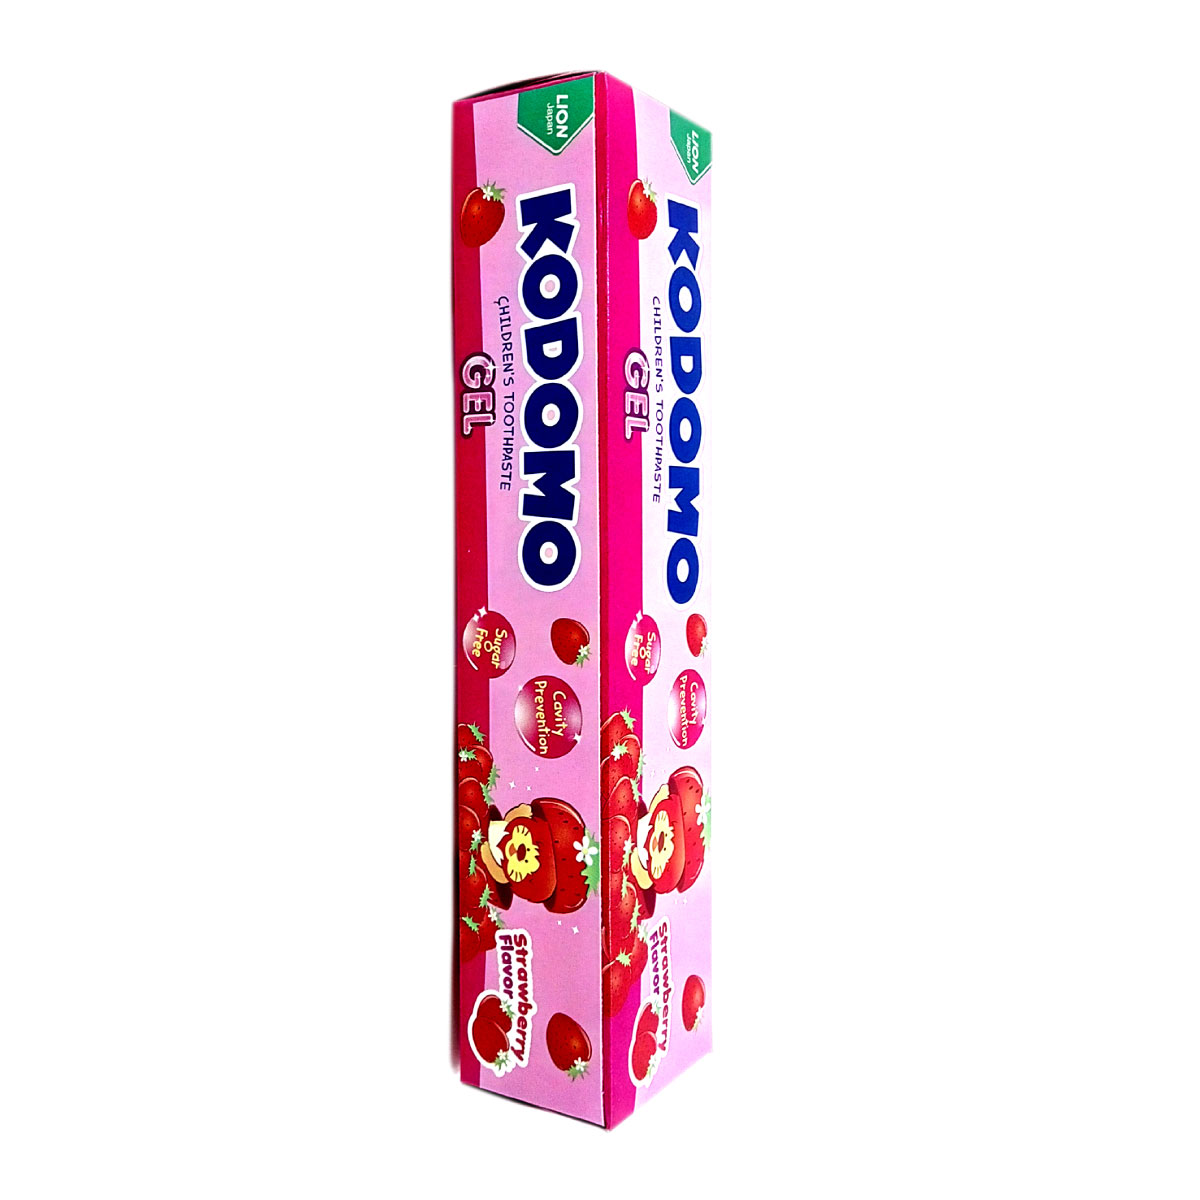 KODOMO Tooth Paste 40 gm Gel